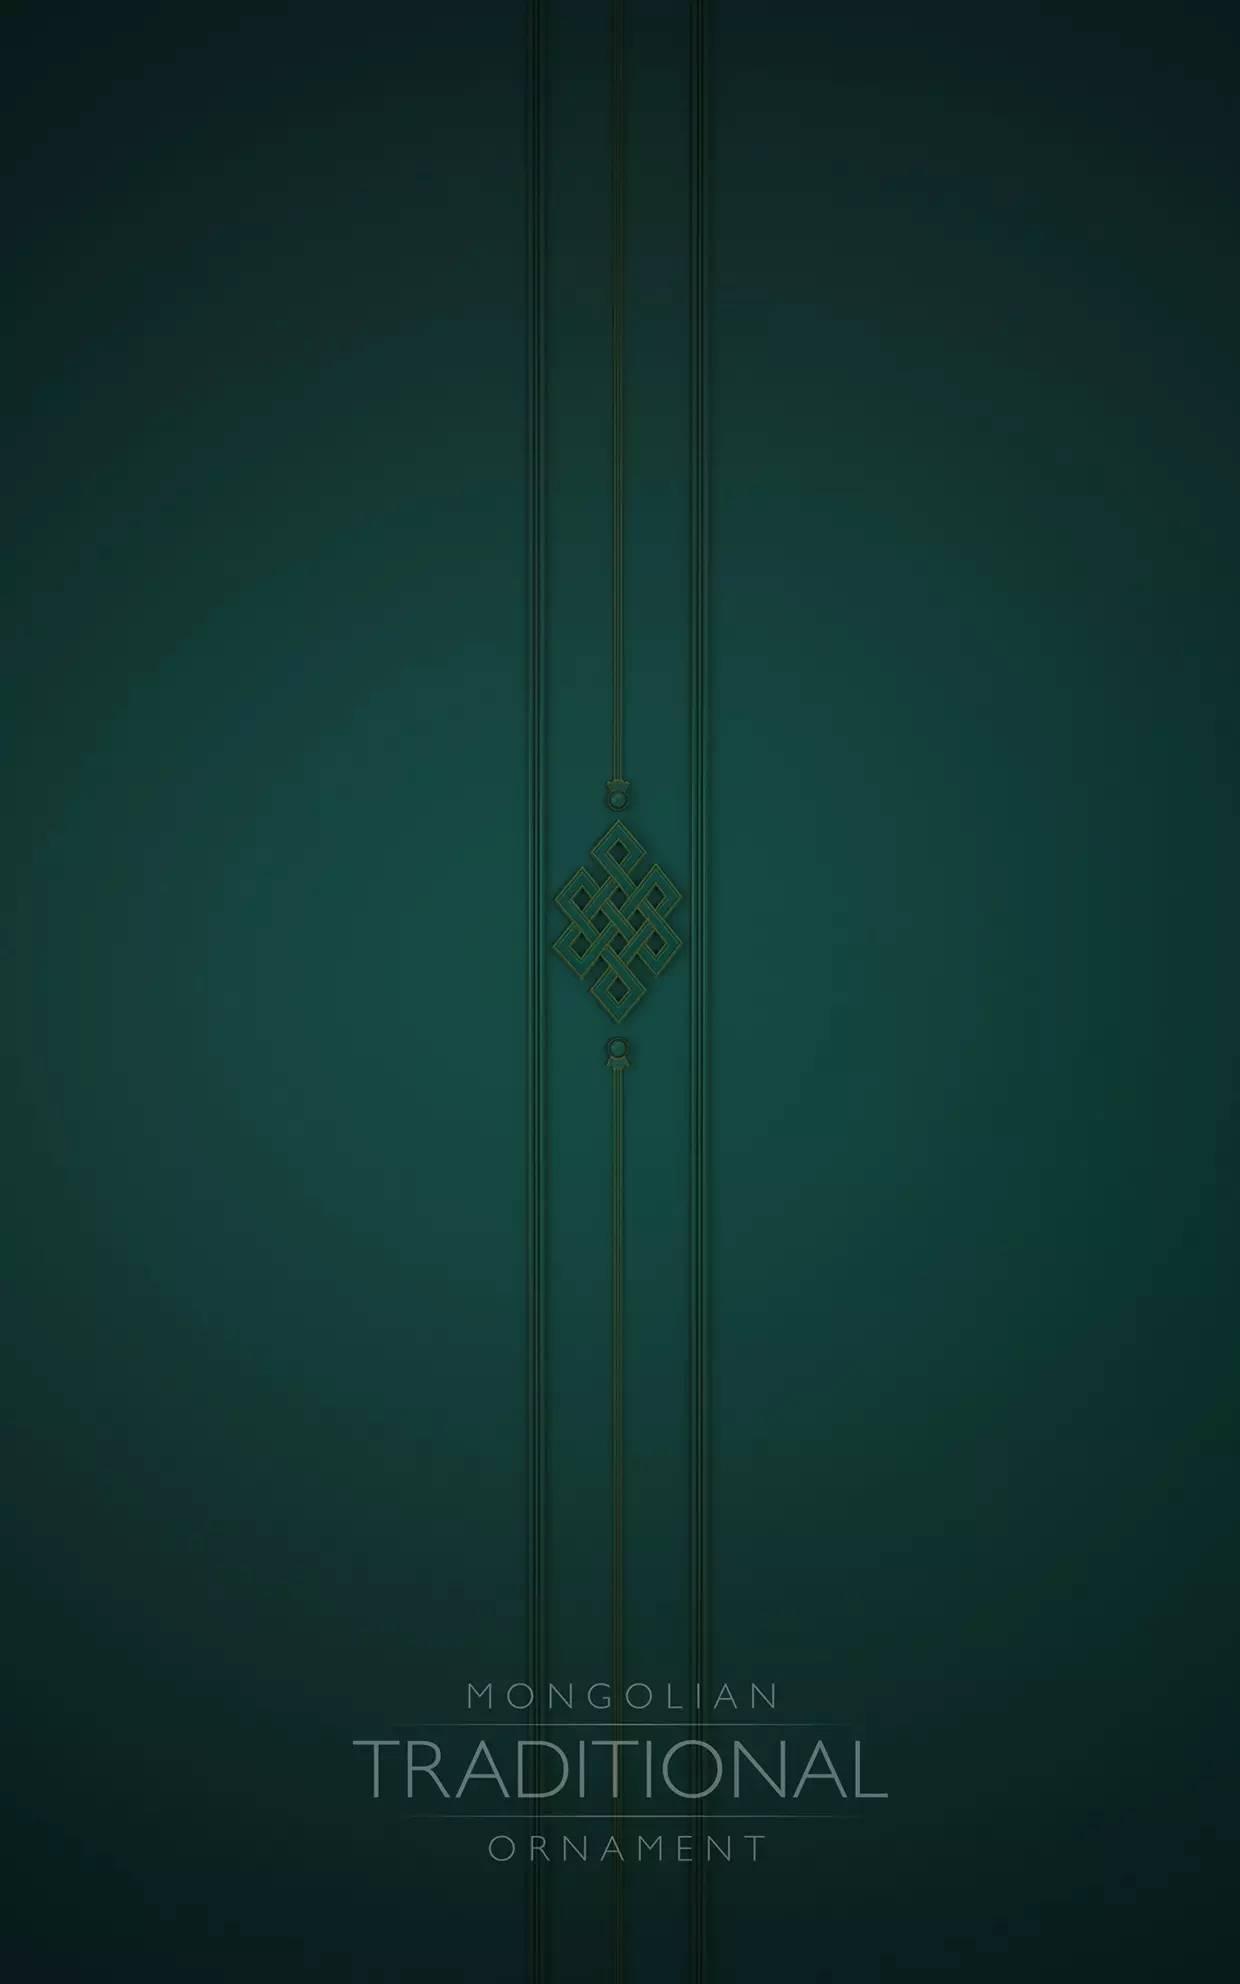 室内设计|蒙族传统装饰(Mongolian Traditional Ornament) 第3张